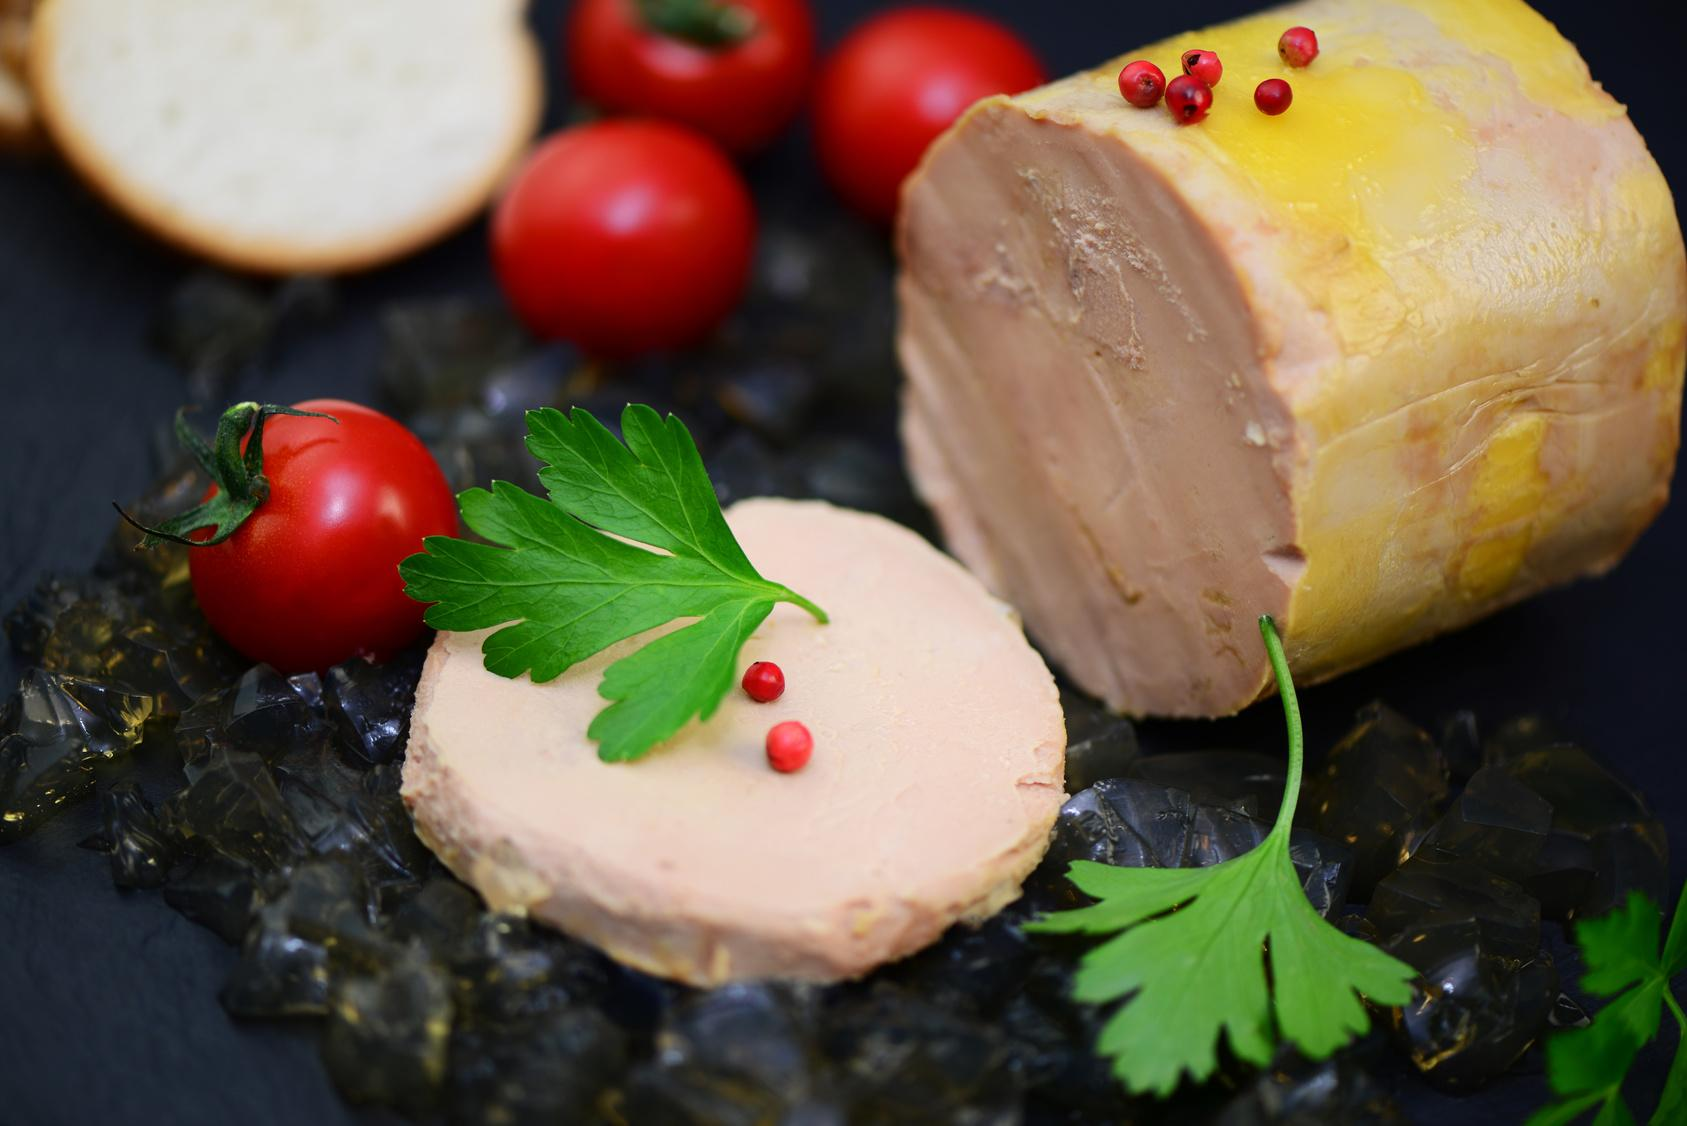 recettes foie gras cuisine madame figaro. Black Bedroom Furniture Sets. Home Design Ideas